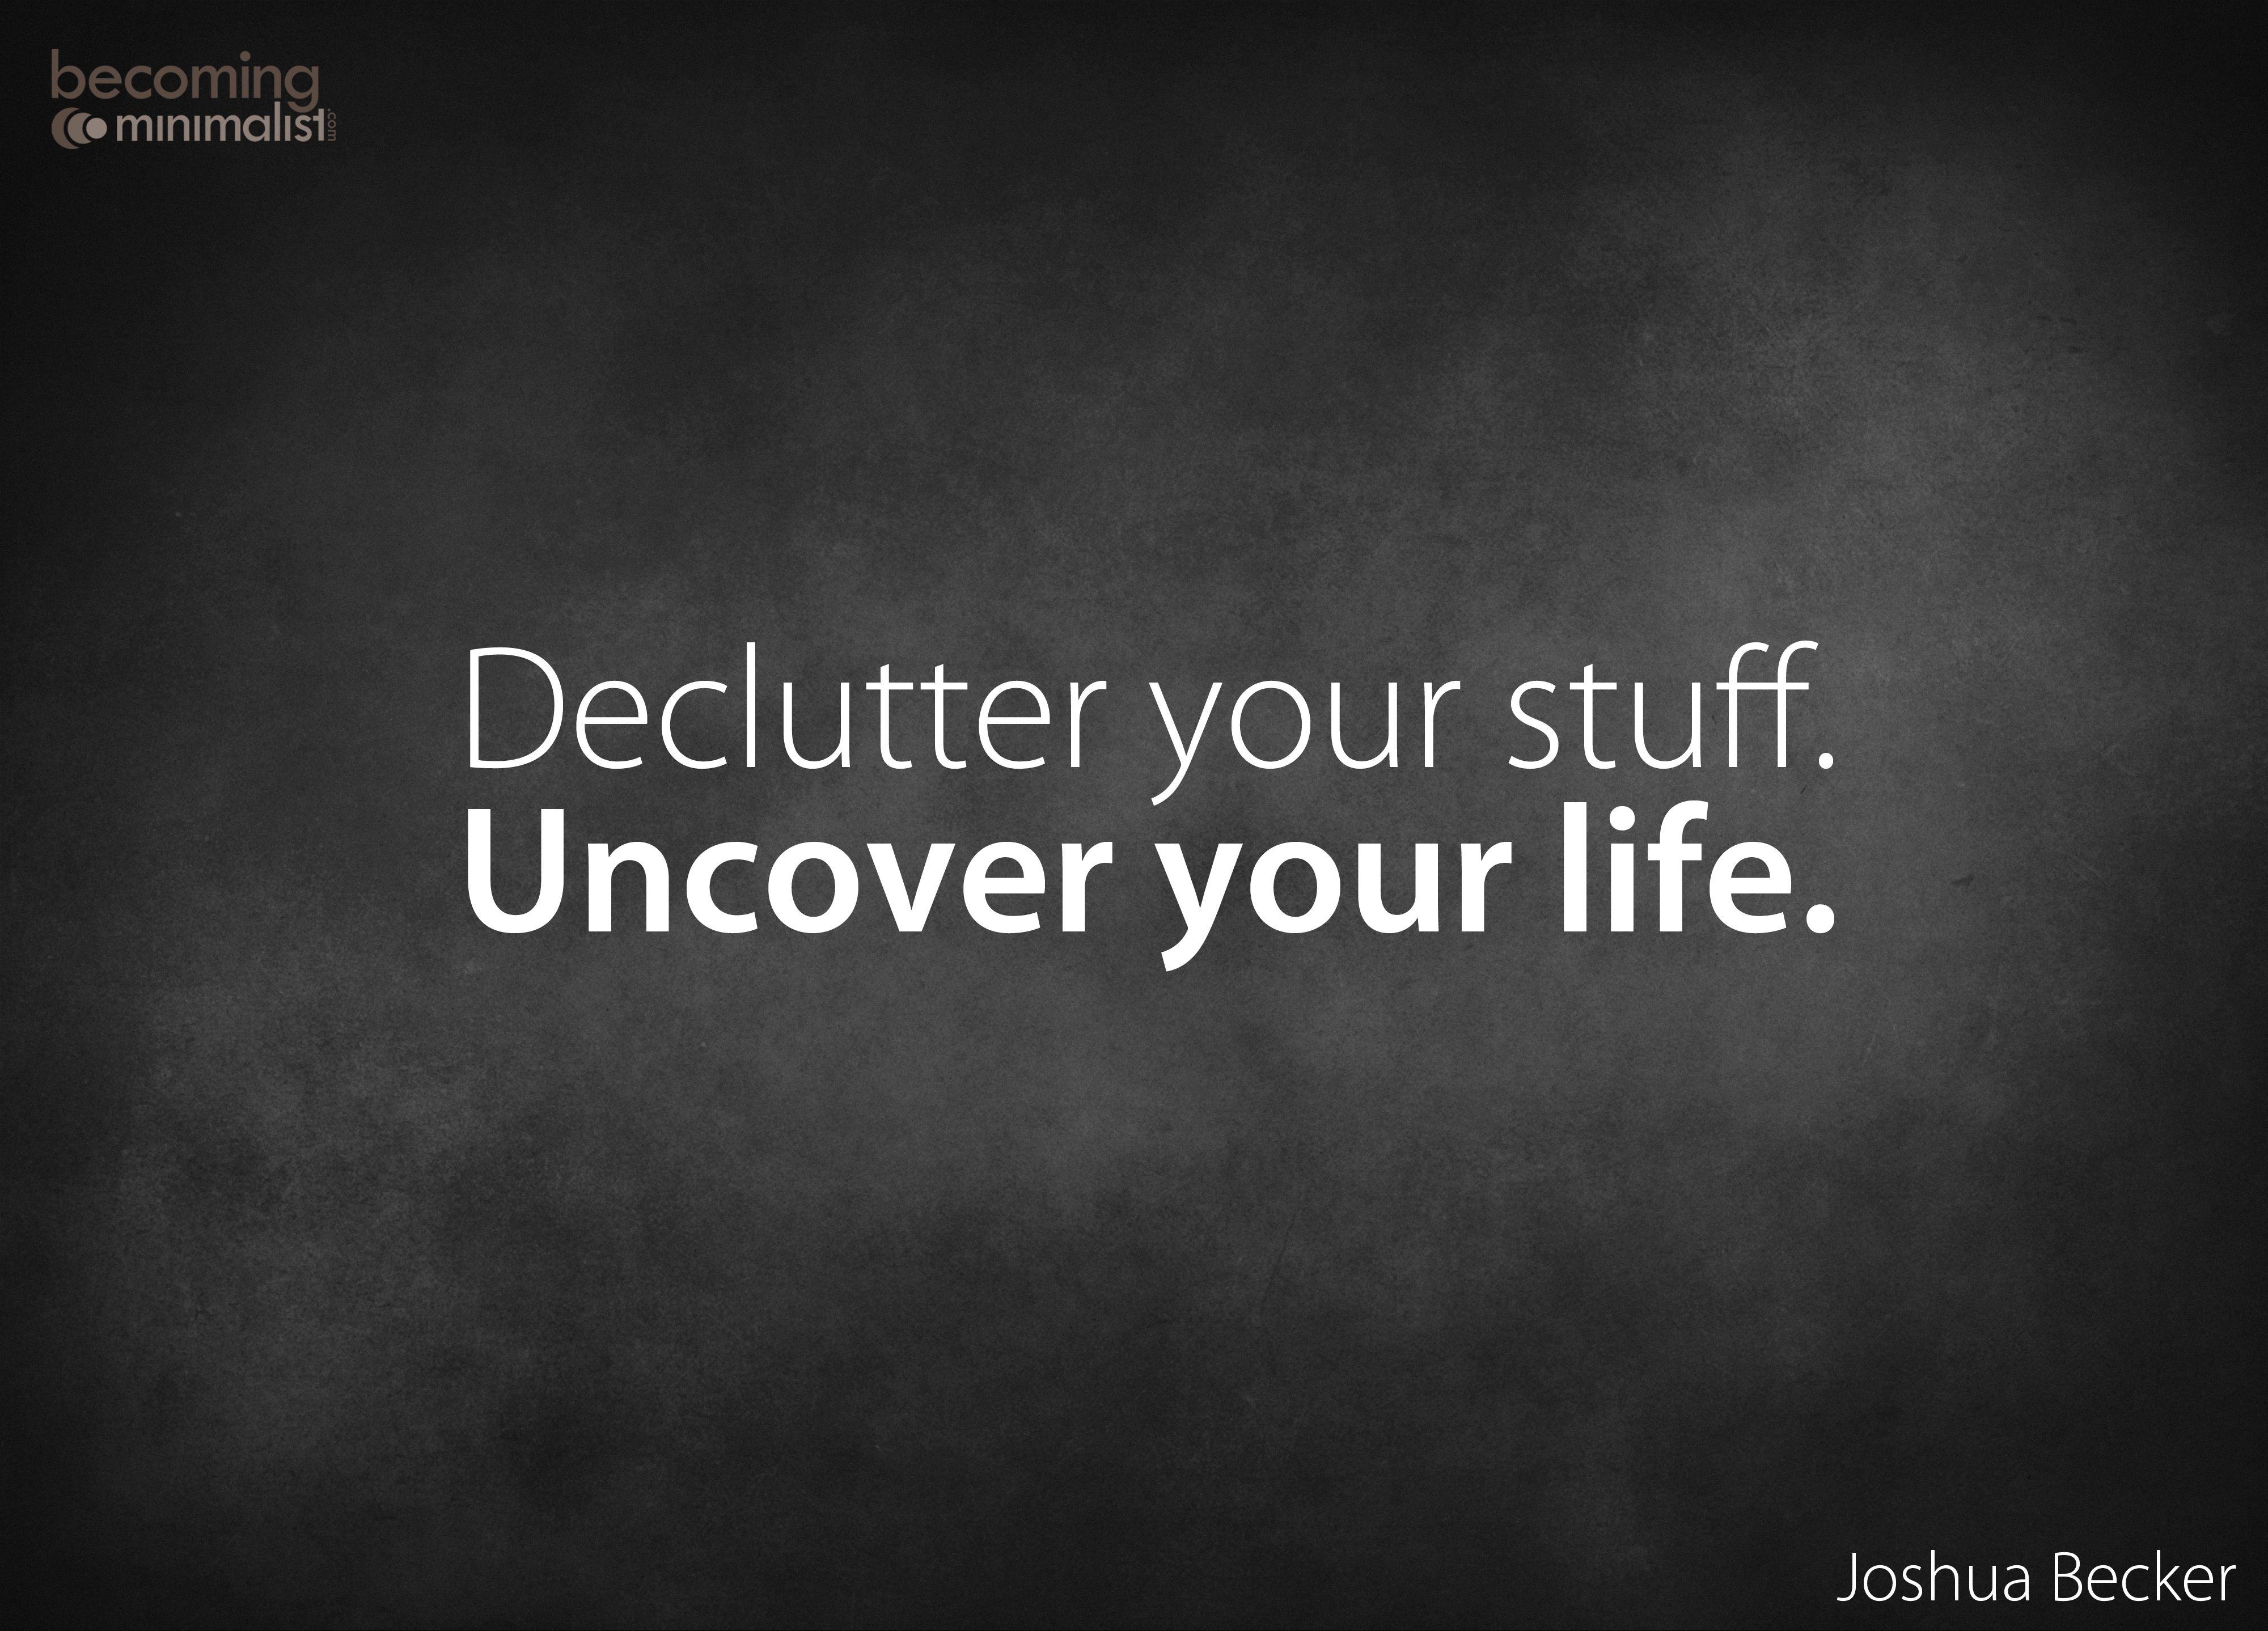 Via becoming minimalist minimalism pinterest for Declutter minimalist life